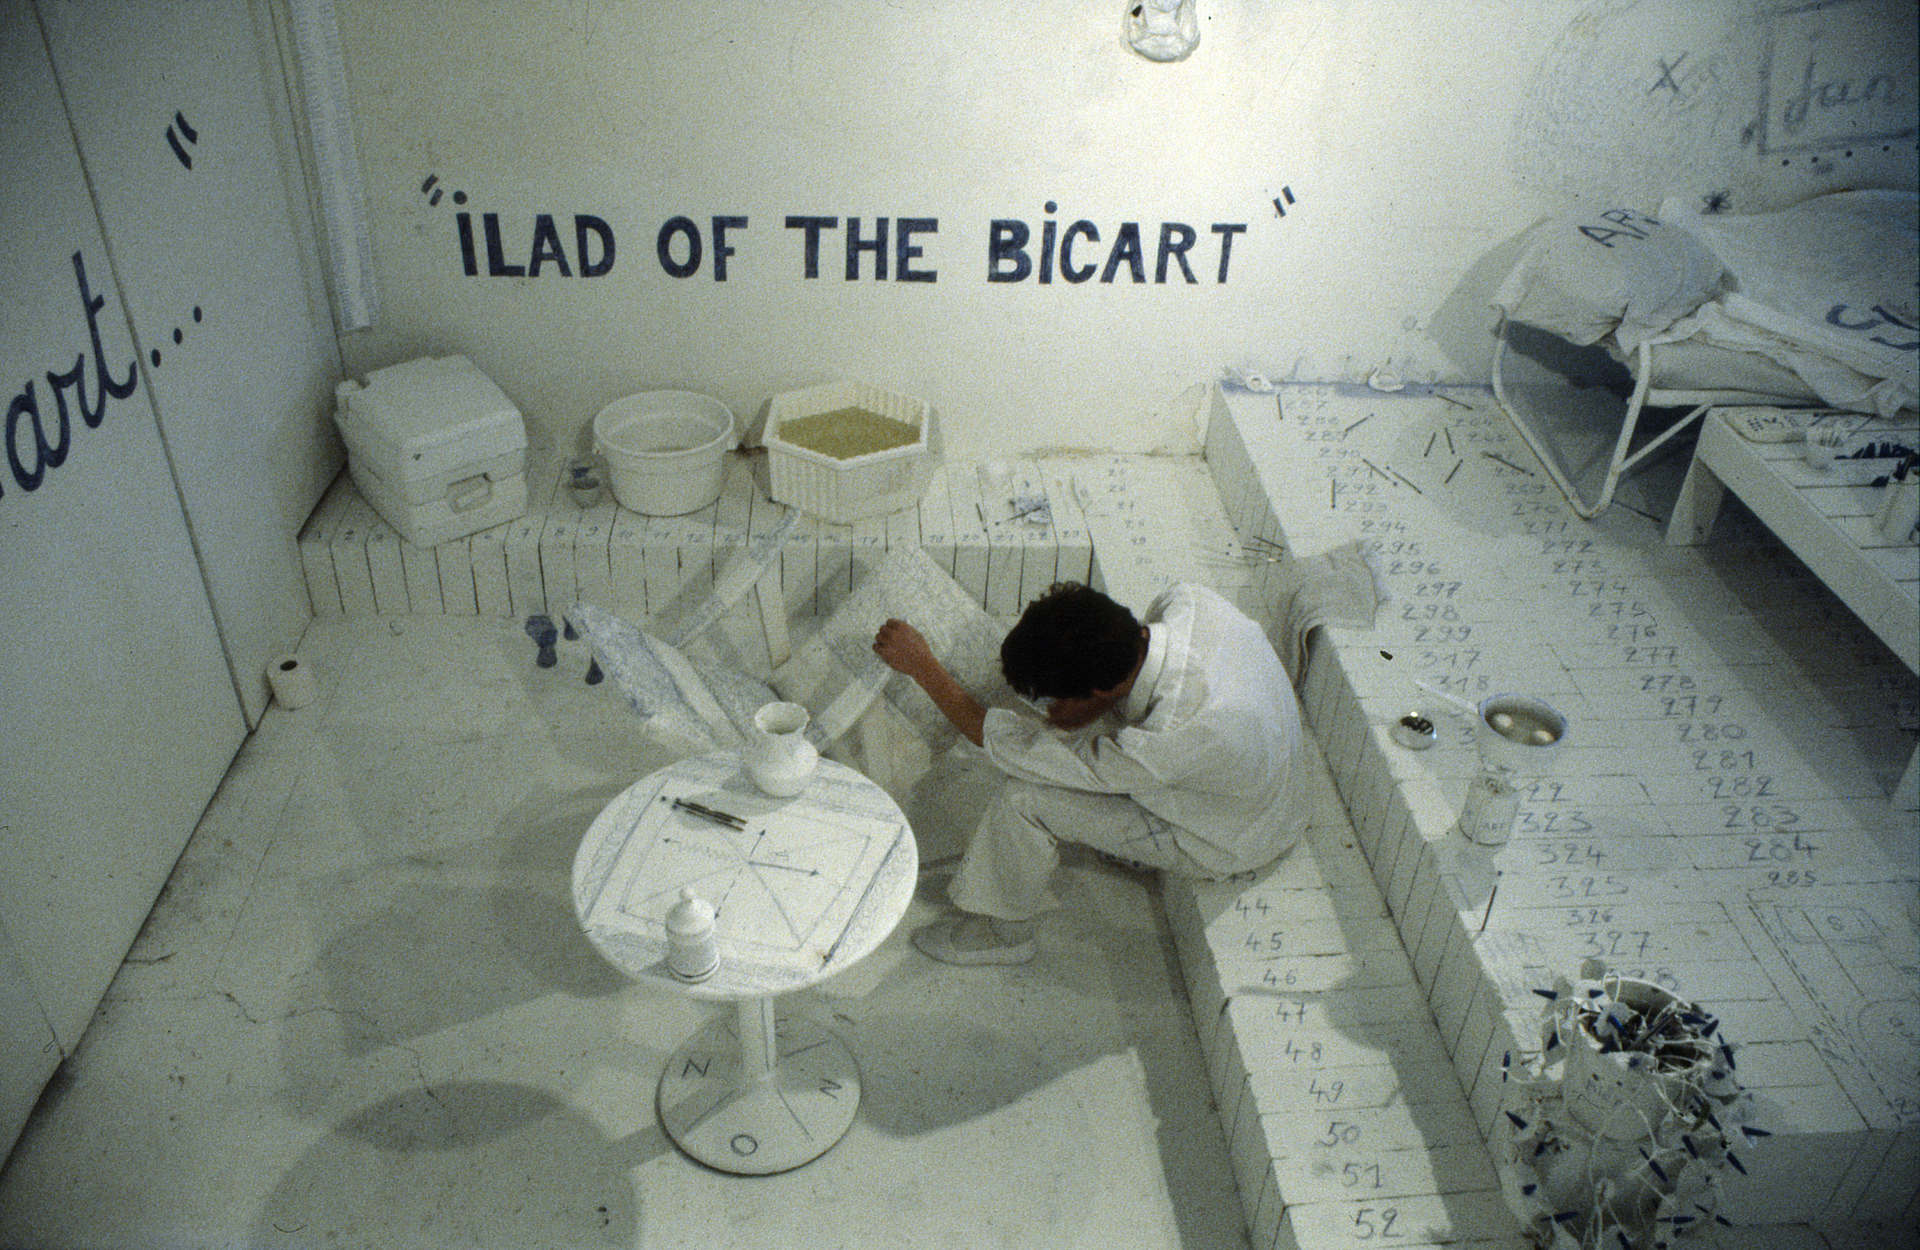 Jan_Fabre,_Ilad_of_the_Bic_Art,_The_Bic_Art_Room,_1981_installation,_Salon_Odessa,_Leiden,_Nederland,_photo_Fred_Balhuizen_courtesy_Angelos